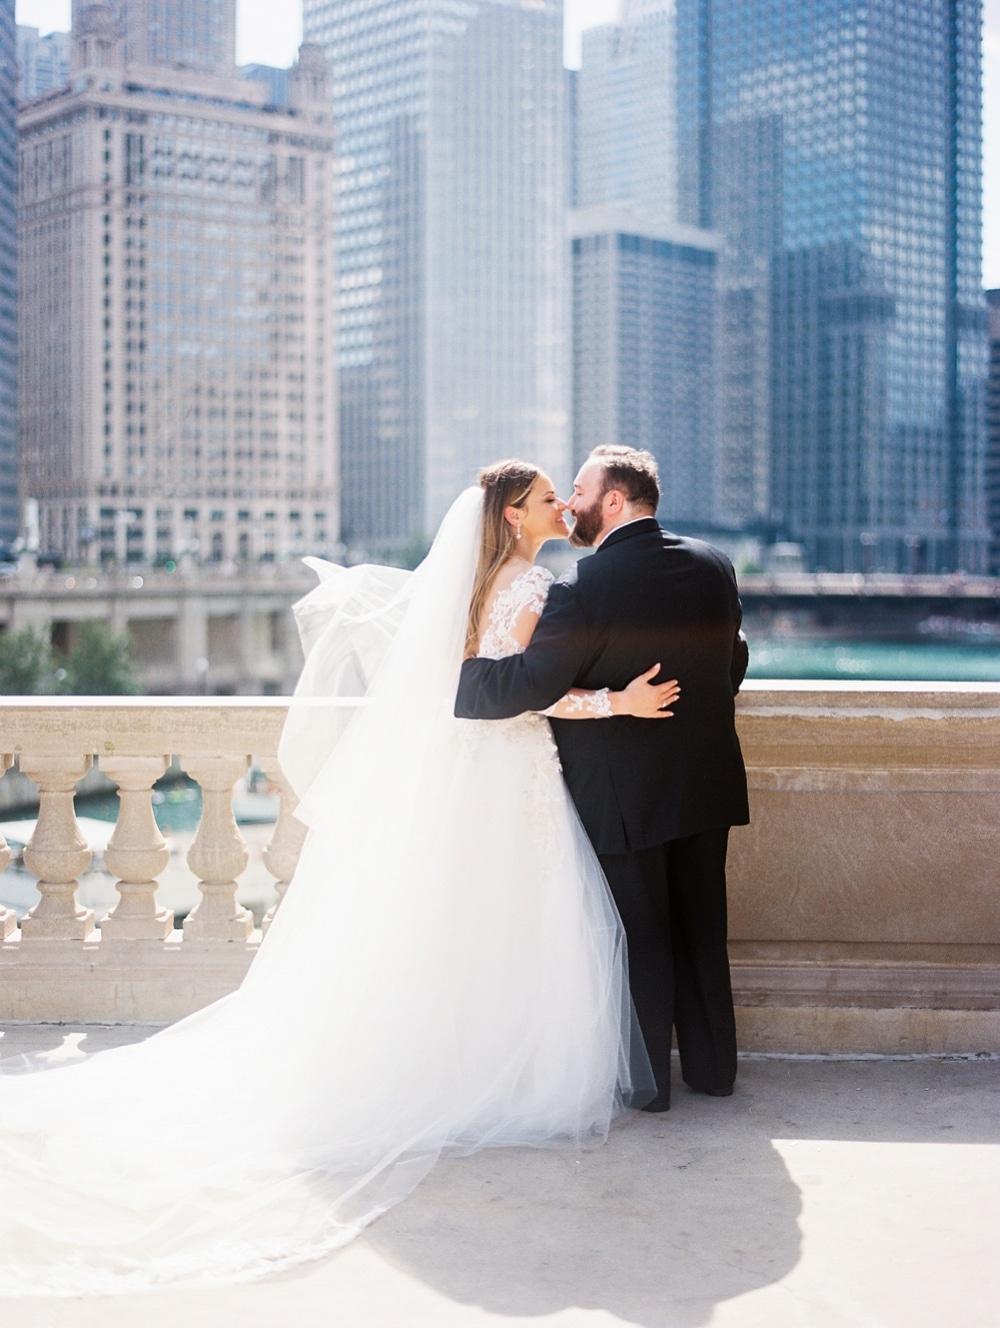 Kristin-La-Voie-Photography-field-museum-chicago-wedding-photos-24